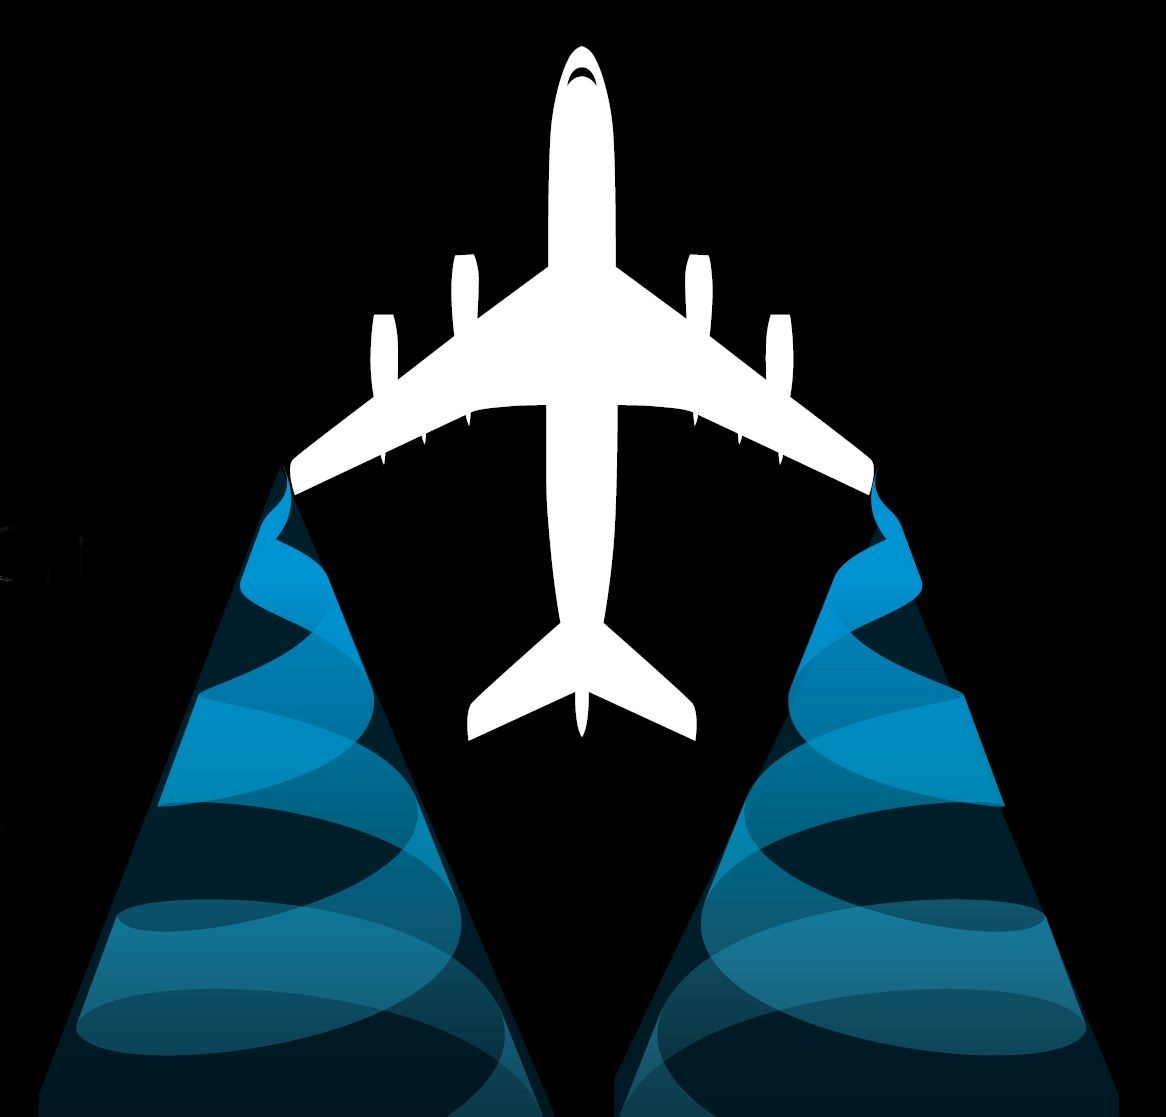 London Heathrow_LHR_Time Based Seperation